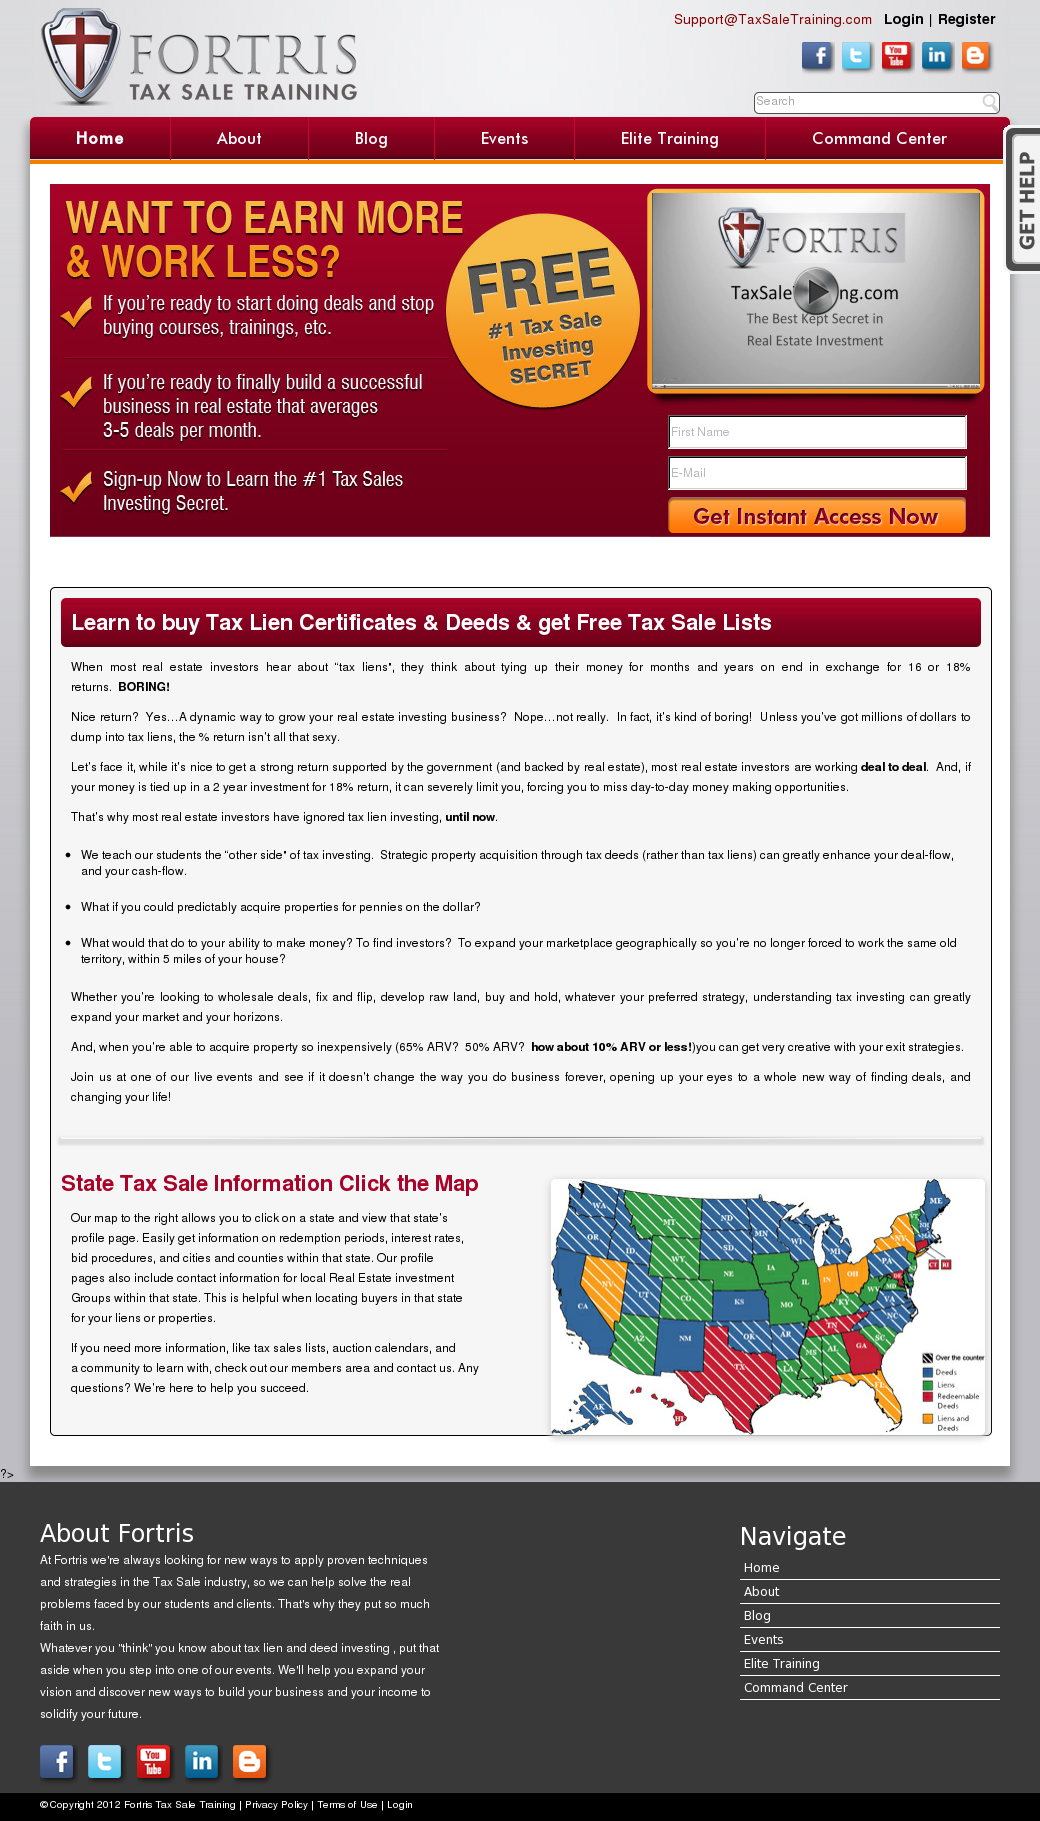 Taxsaletraining Competitors, Revenue and Employees - Owler Company Profile